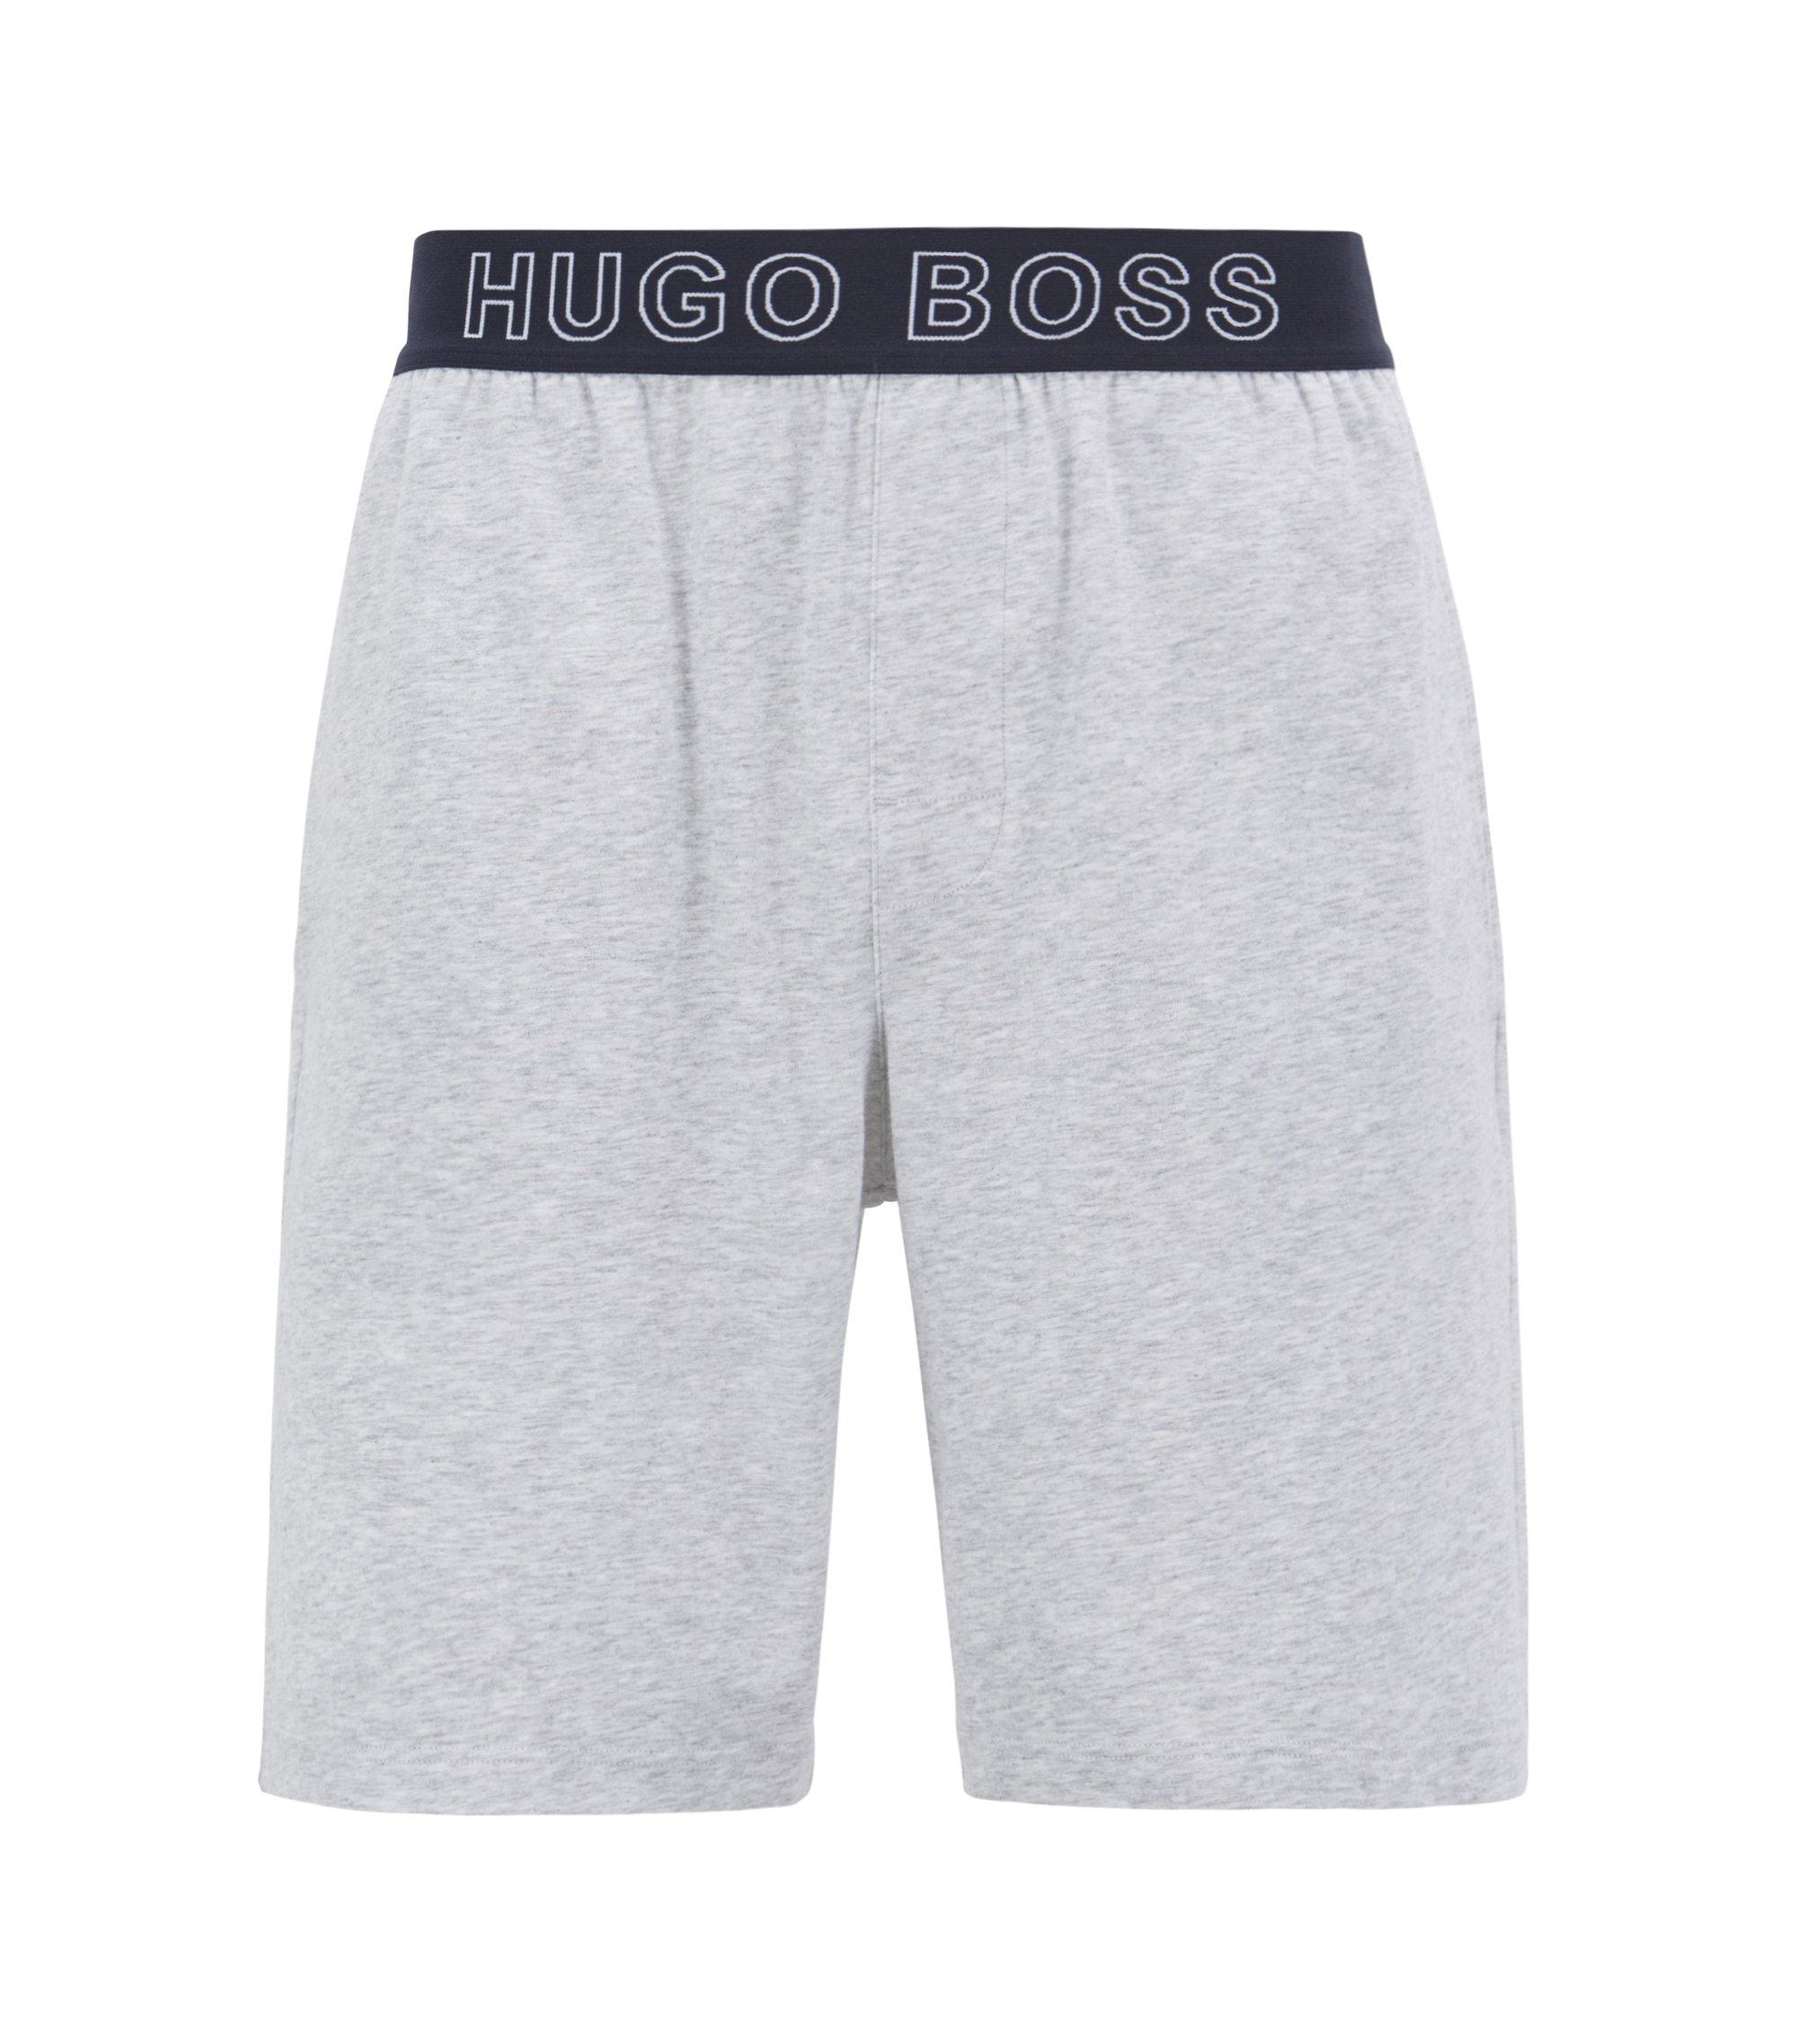 Pyjama-Shorts aus Stretch-Baumwolle mit Jacquard-Logo am Bund, Grau